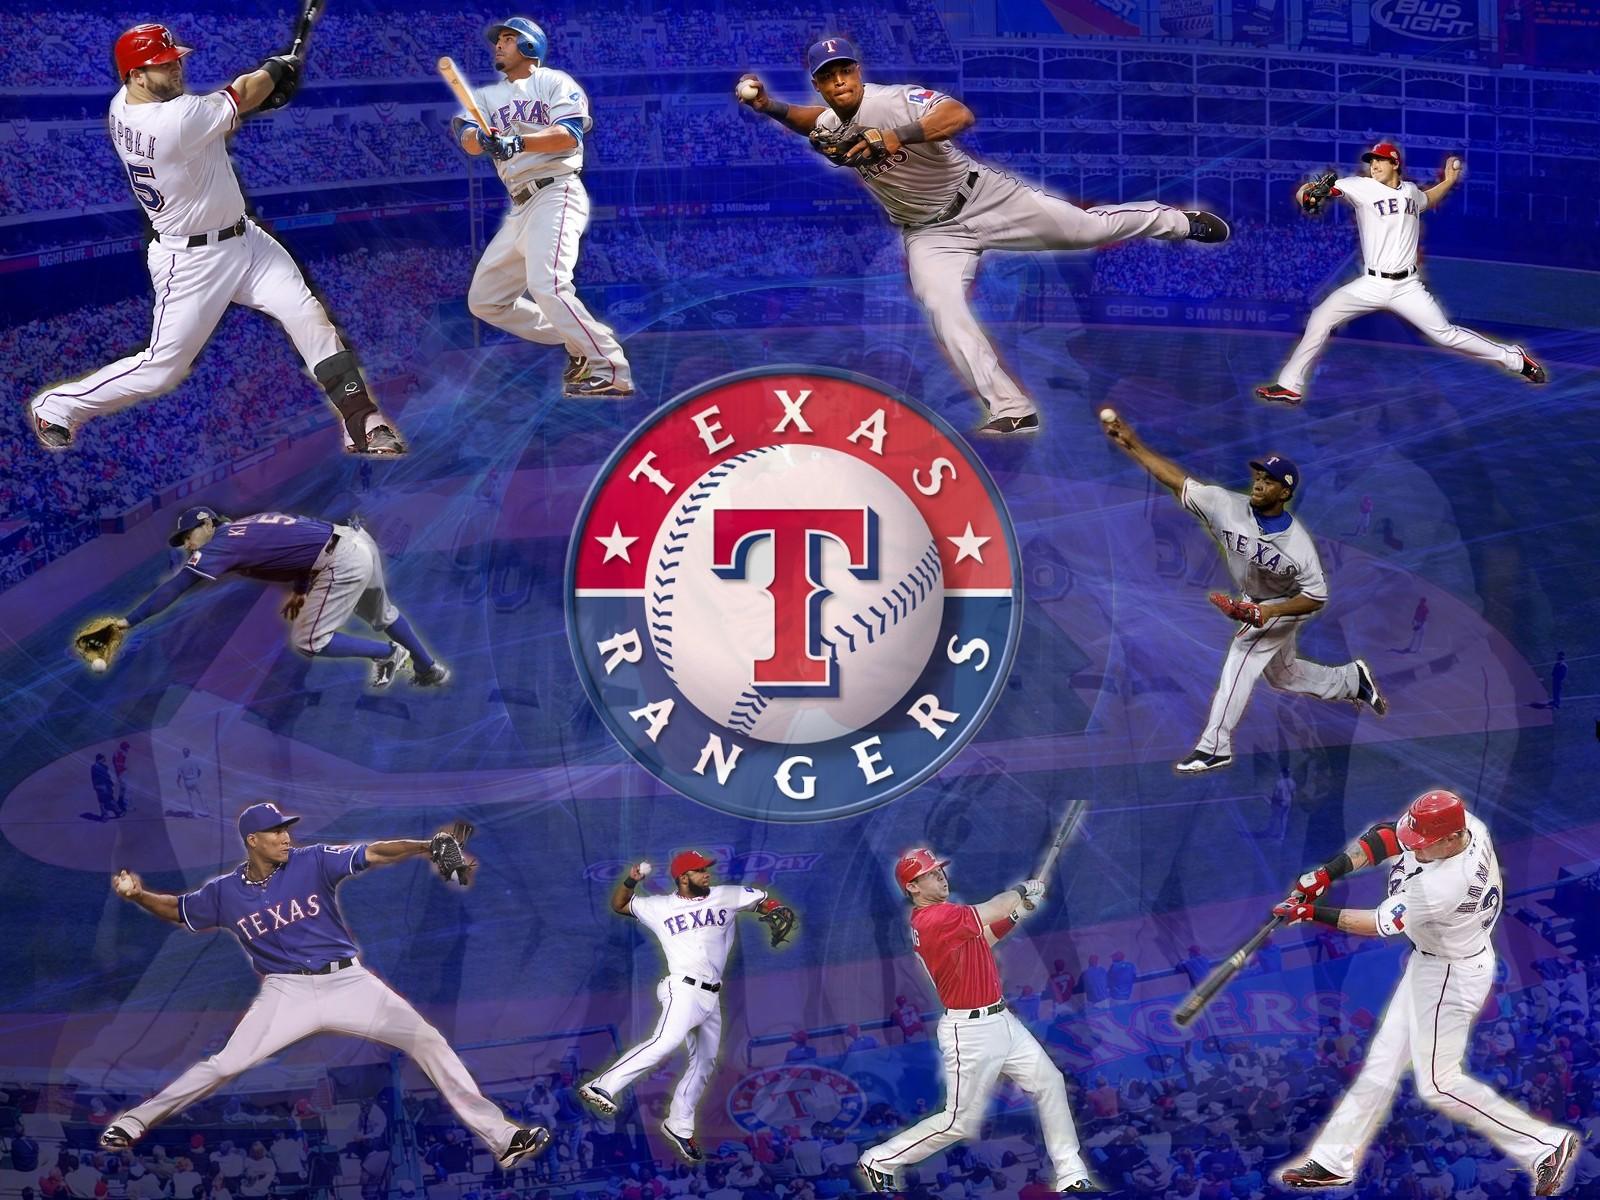 Texas Rangers HD images Texas Rangers wallpapers 1600x1200